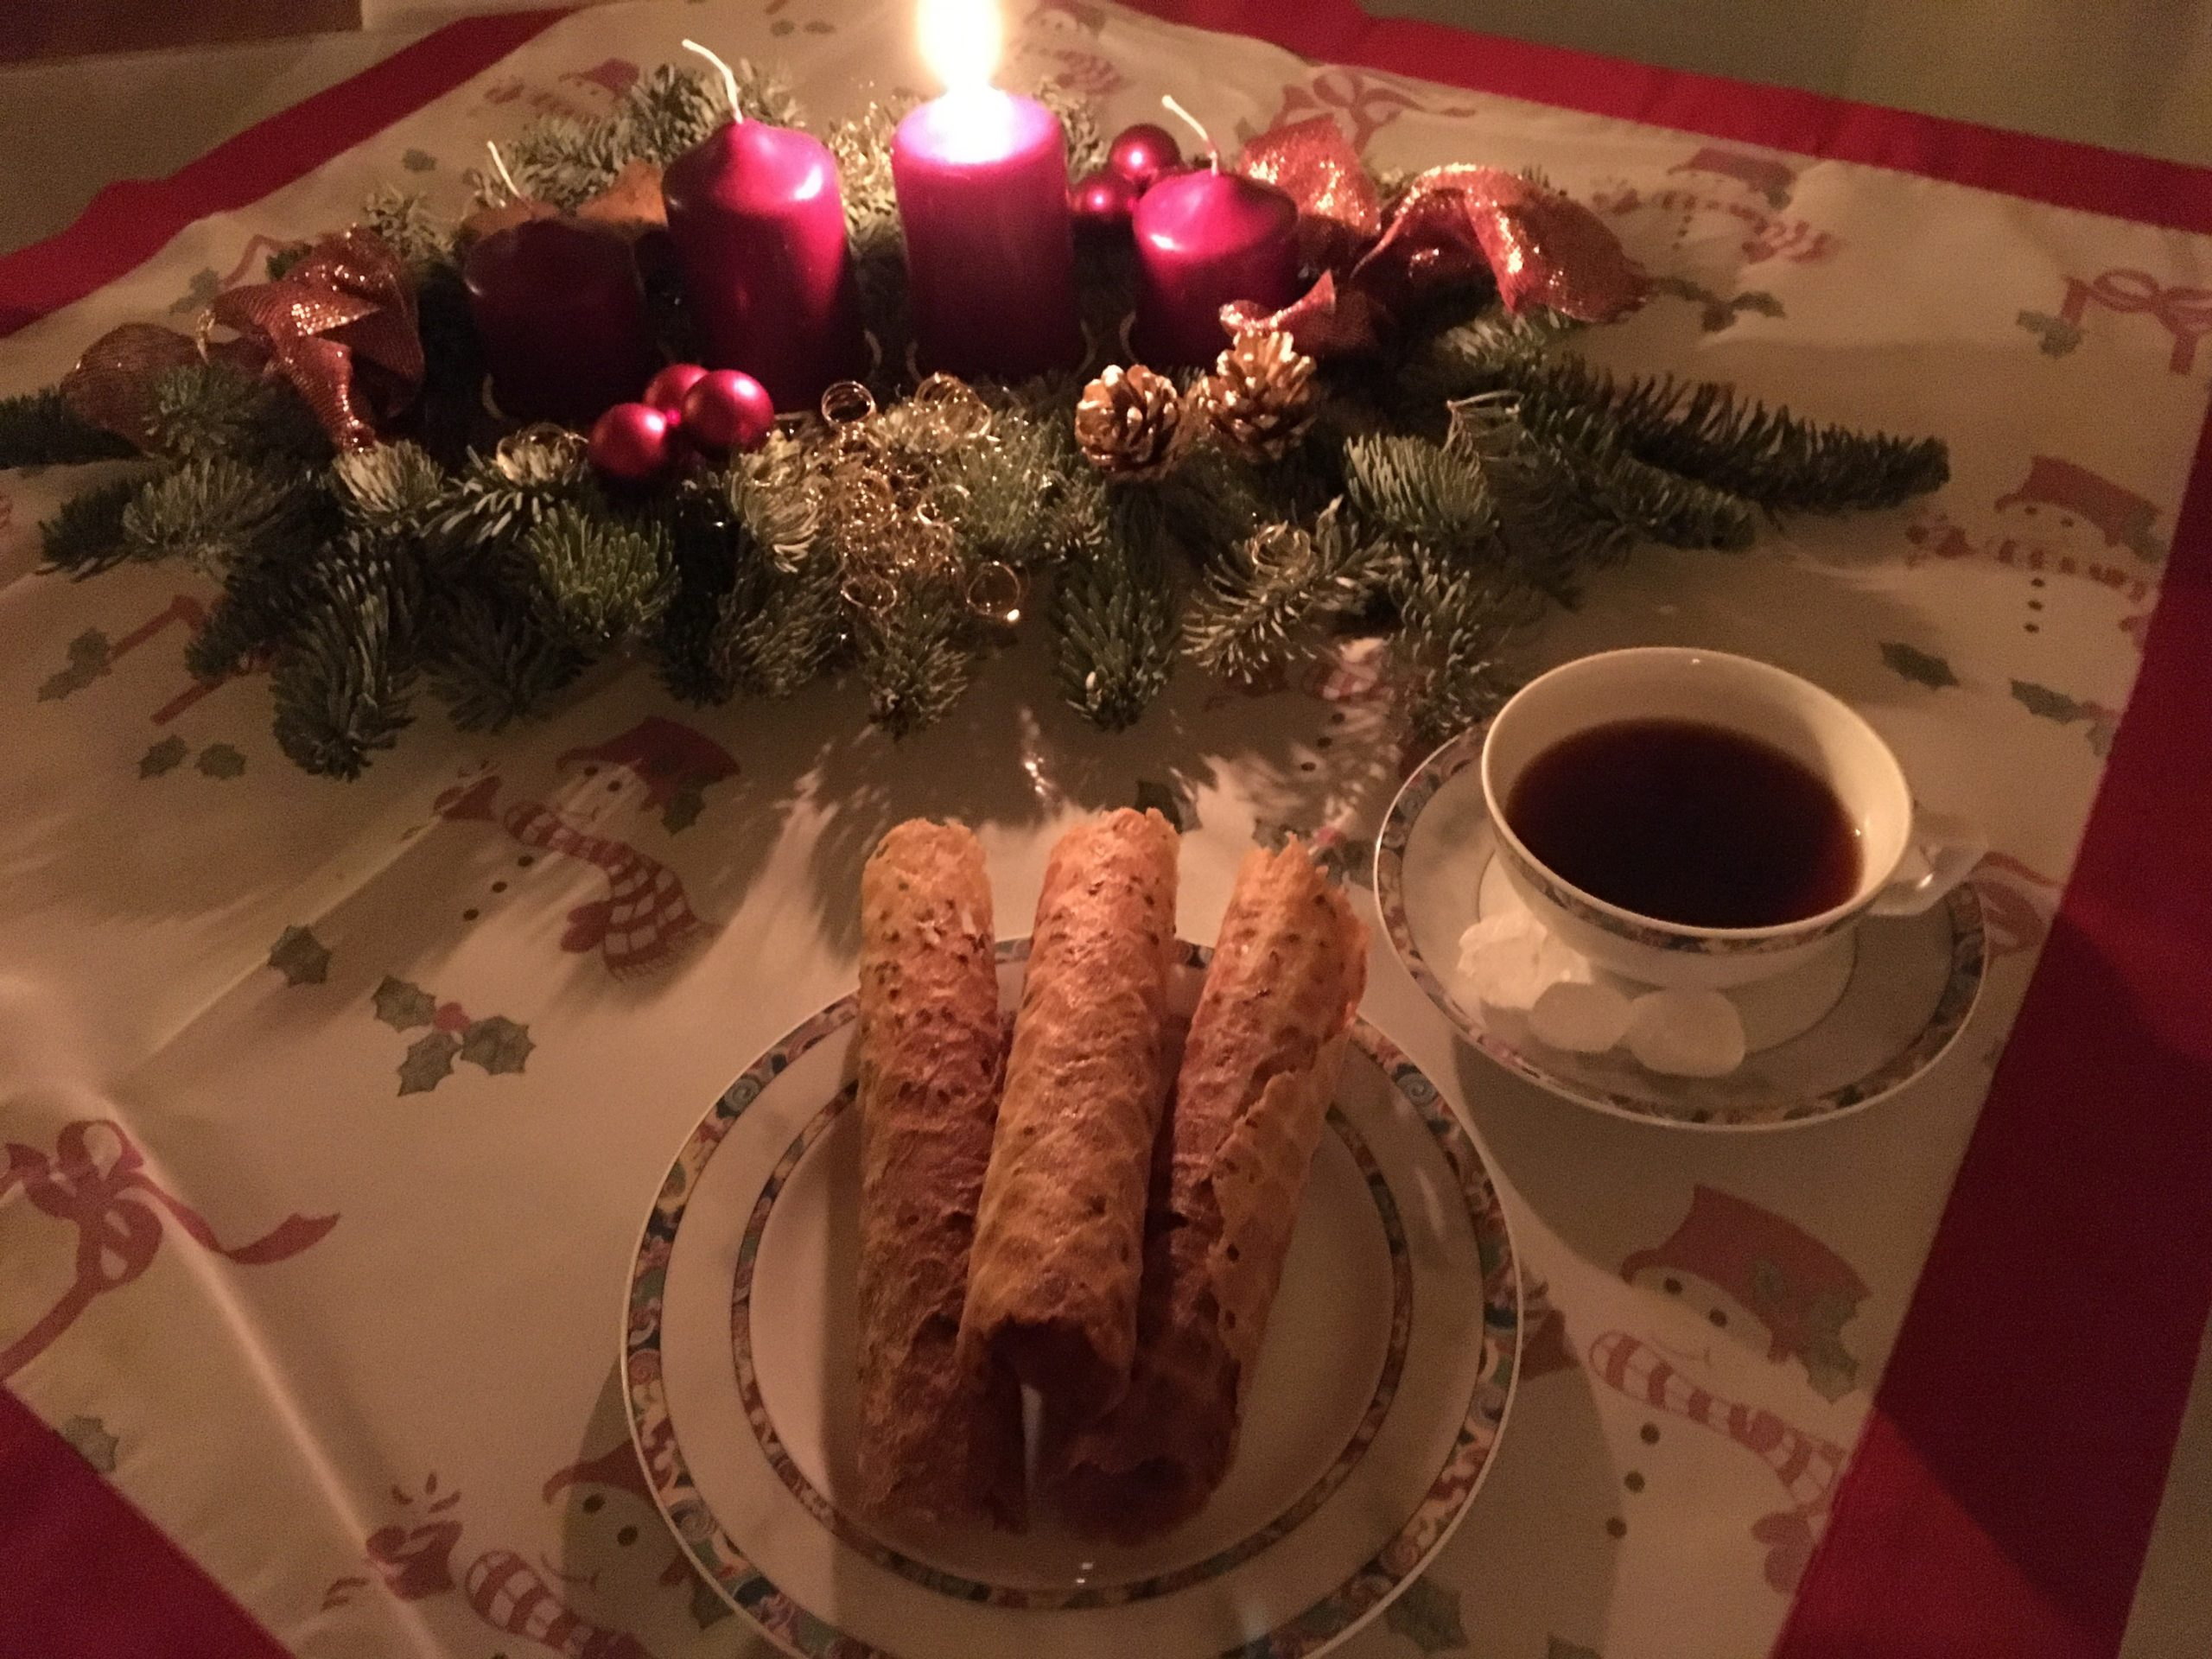 Rezept: Krüllkuchen Neujahrsröllchen selber machen